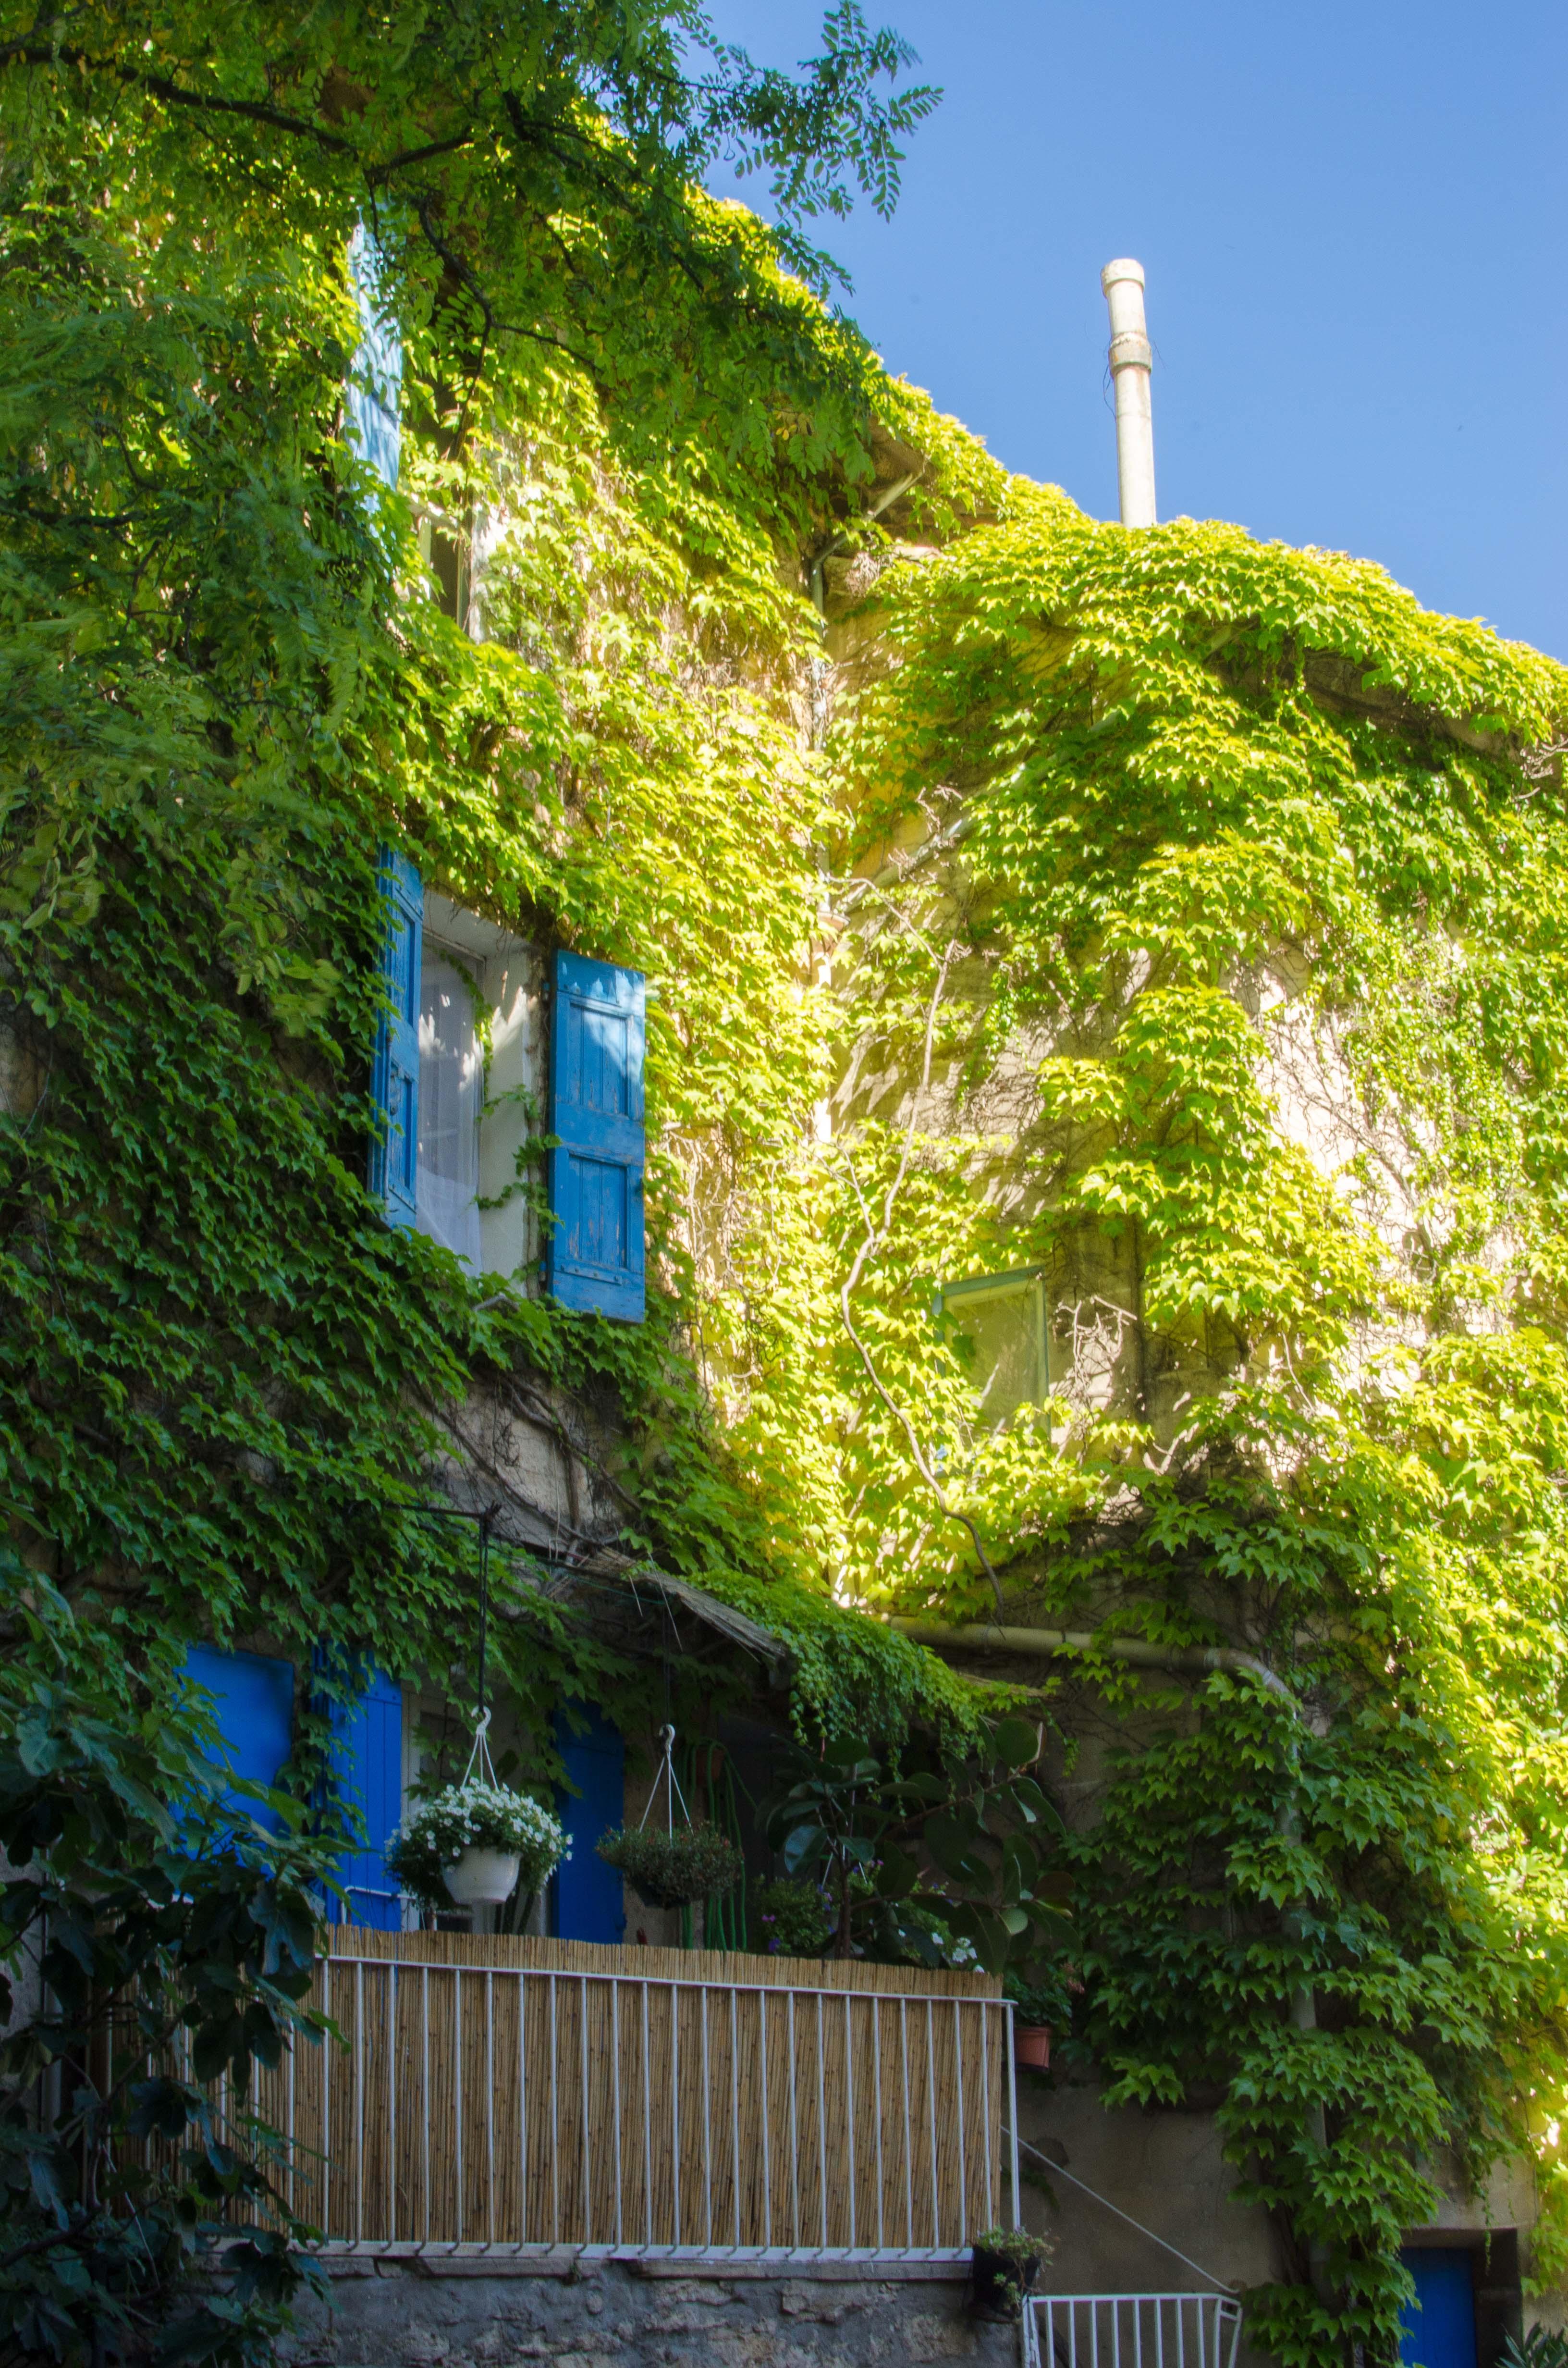 provenza21 Vacanze in Provenza, Camargue e Costa Azzurra